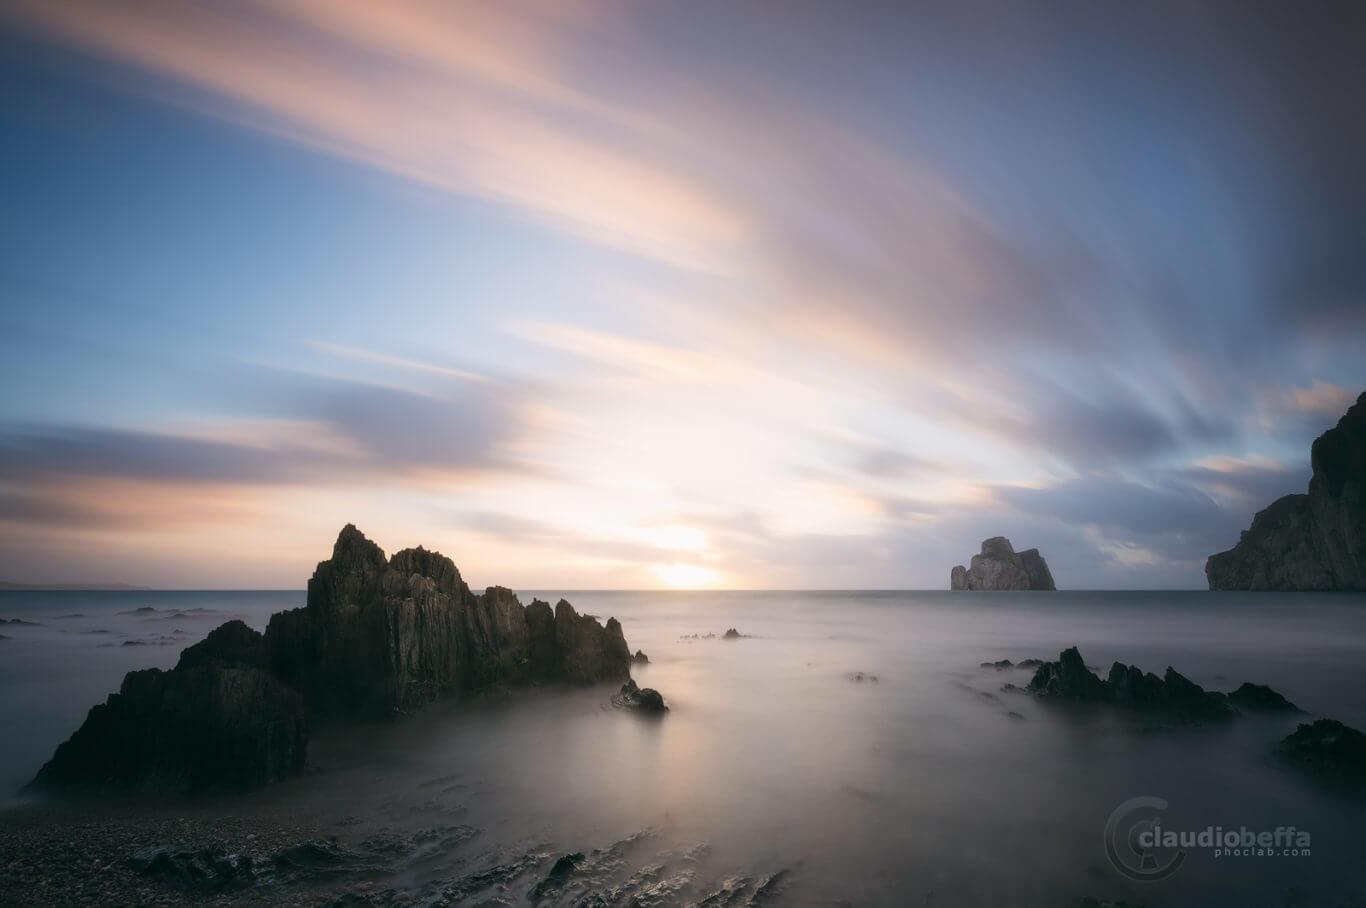 Sunset, Sea, Seascape, Landscape, Island, Pan di zucchero, Rocks, Wind, Clouds, Sun, Long exposure, Sardinia, Italy, land of light and wind